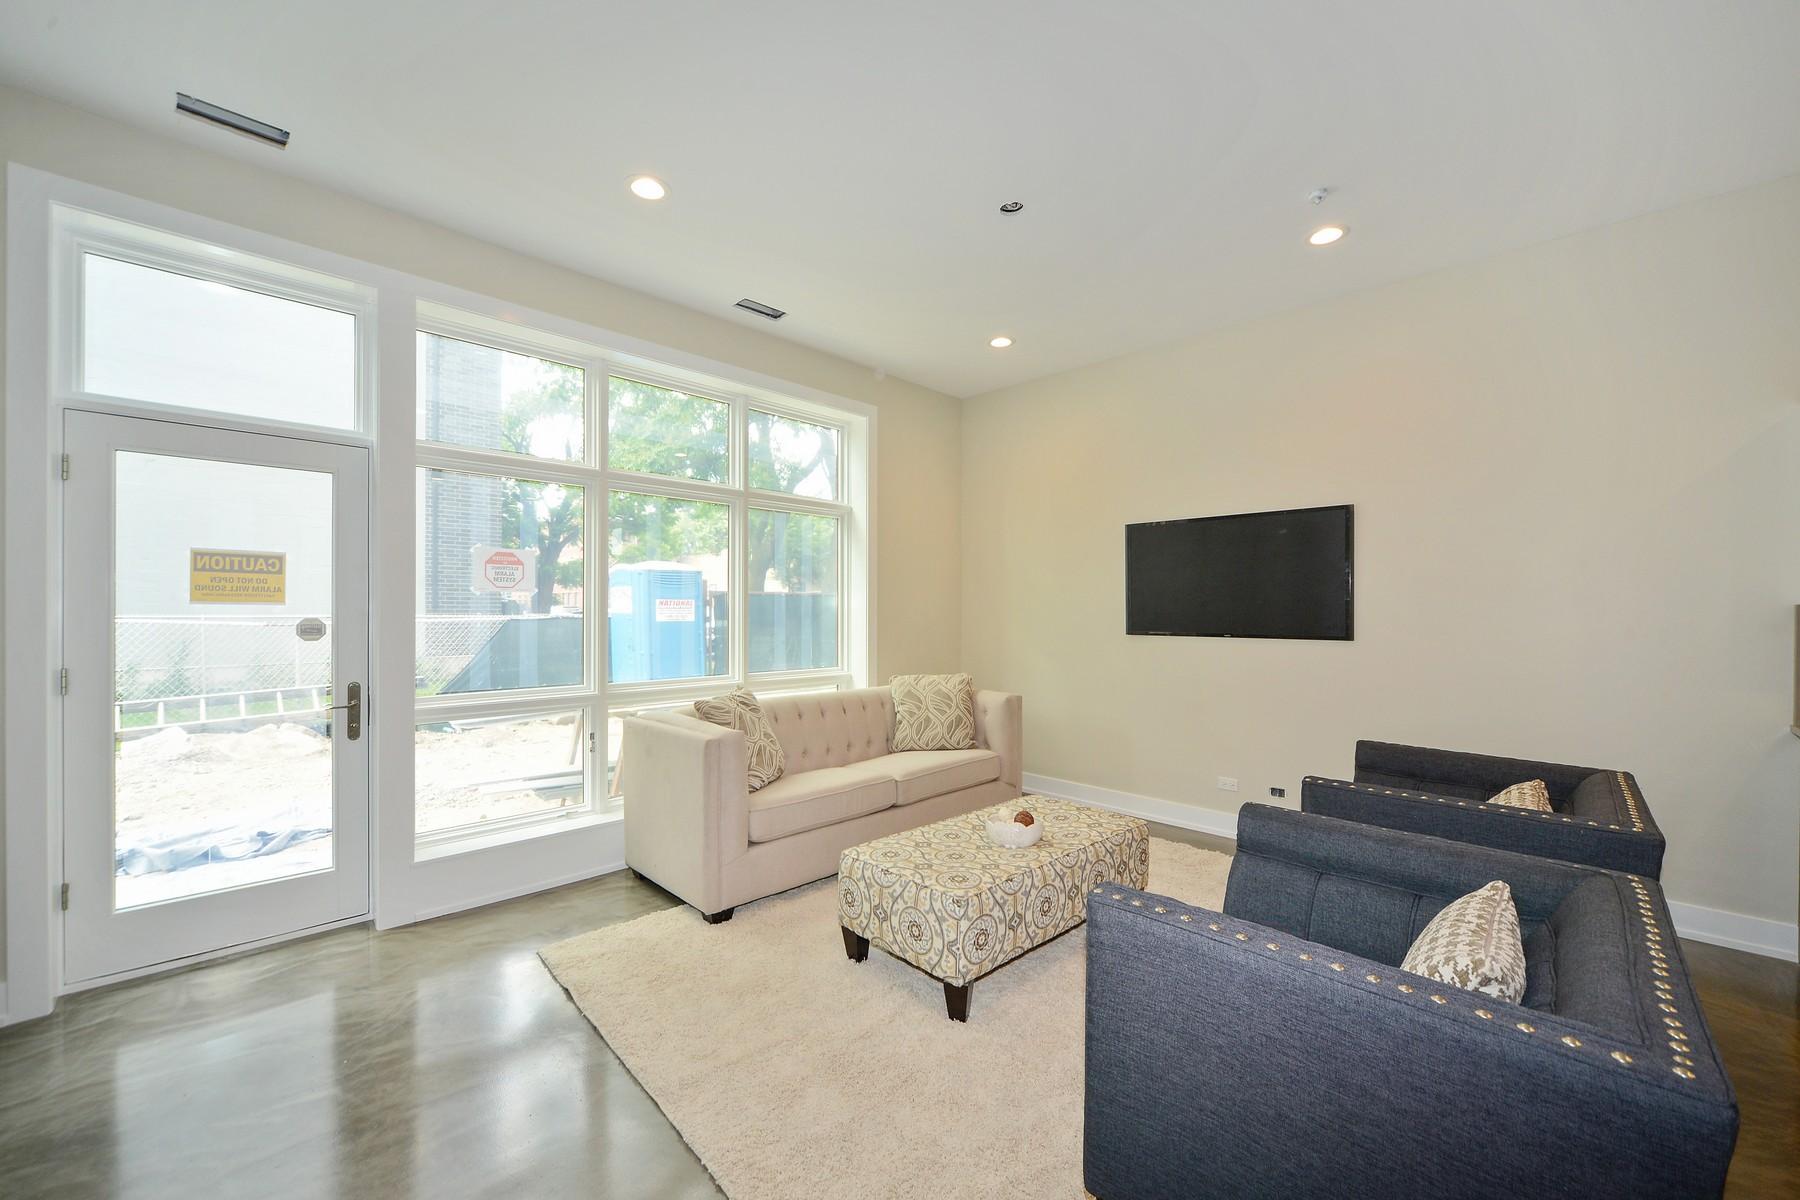 Nhà phố vì Bán tại Gorgeous and sophisticated 3 bedroom, 2.5 bath 2800 W Walton Street Chicago, Illinois, 60622 Hoa Kỳ